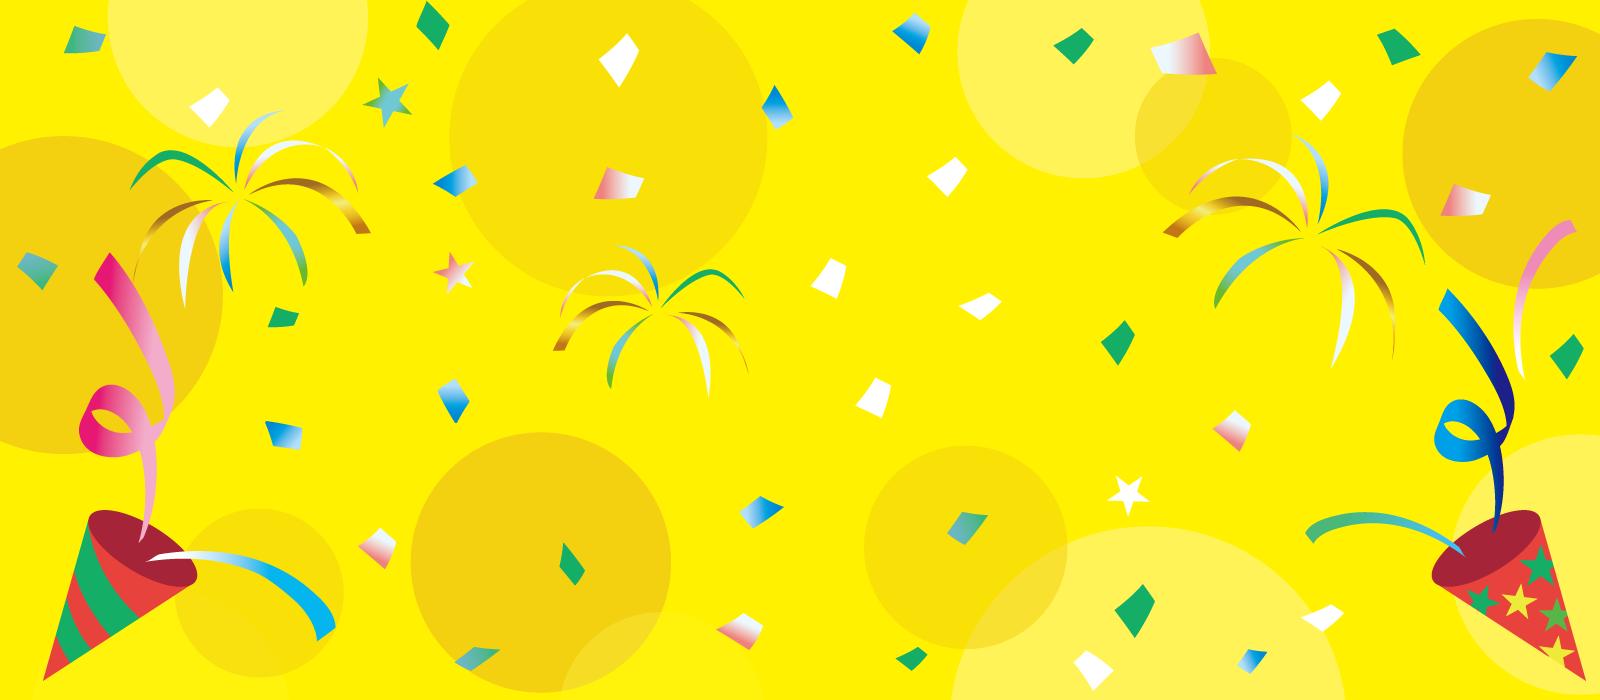 i000580_thanks_blank_yellow